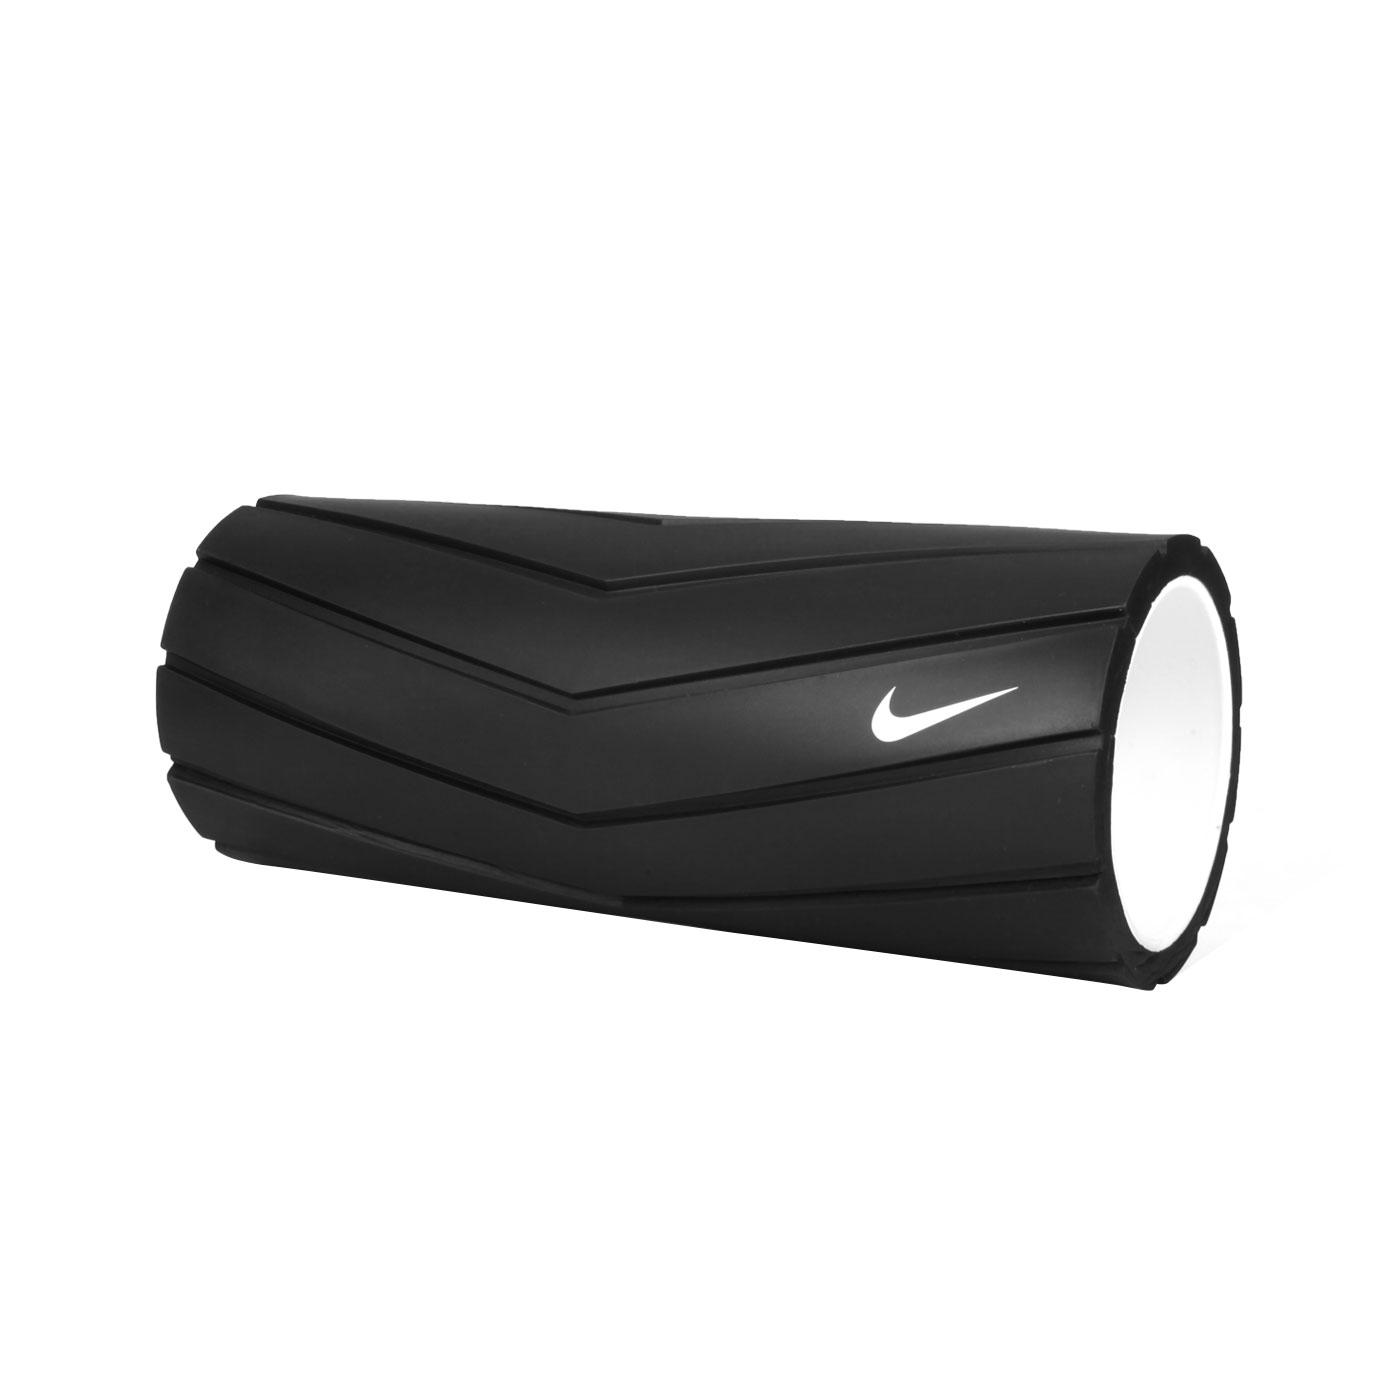 NIKE 輔助滾筒(13吋) N100081602713 - 黑白